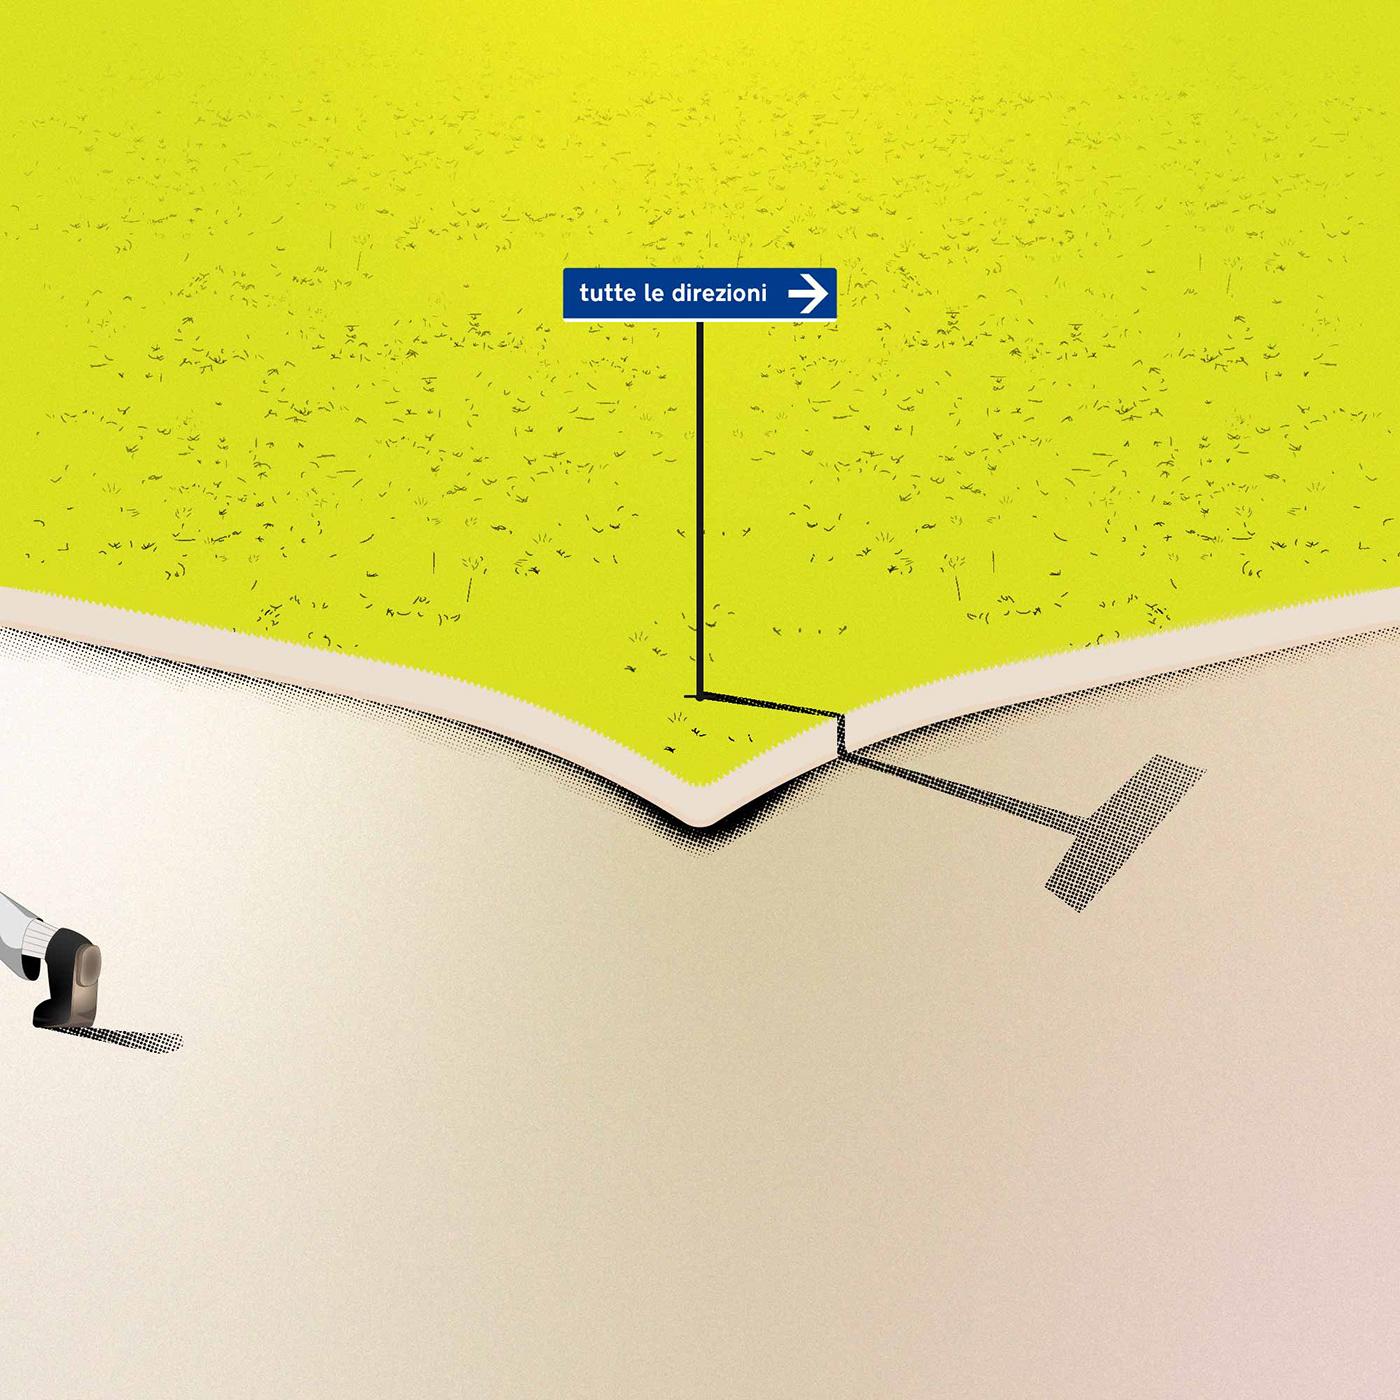 bivio,cartello,choise,corner,ebook,ILLUSTRATION ,scelta,segnaletica